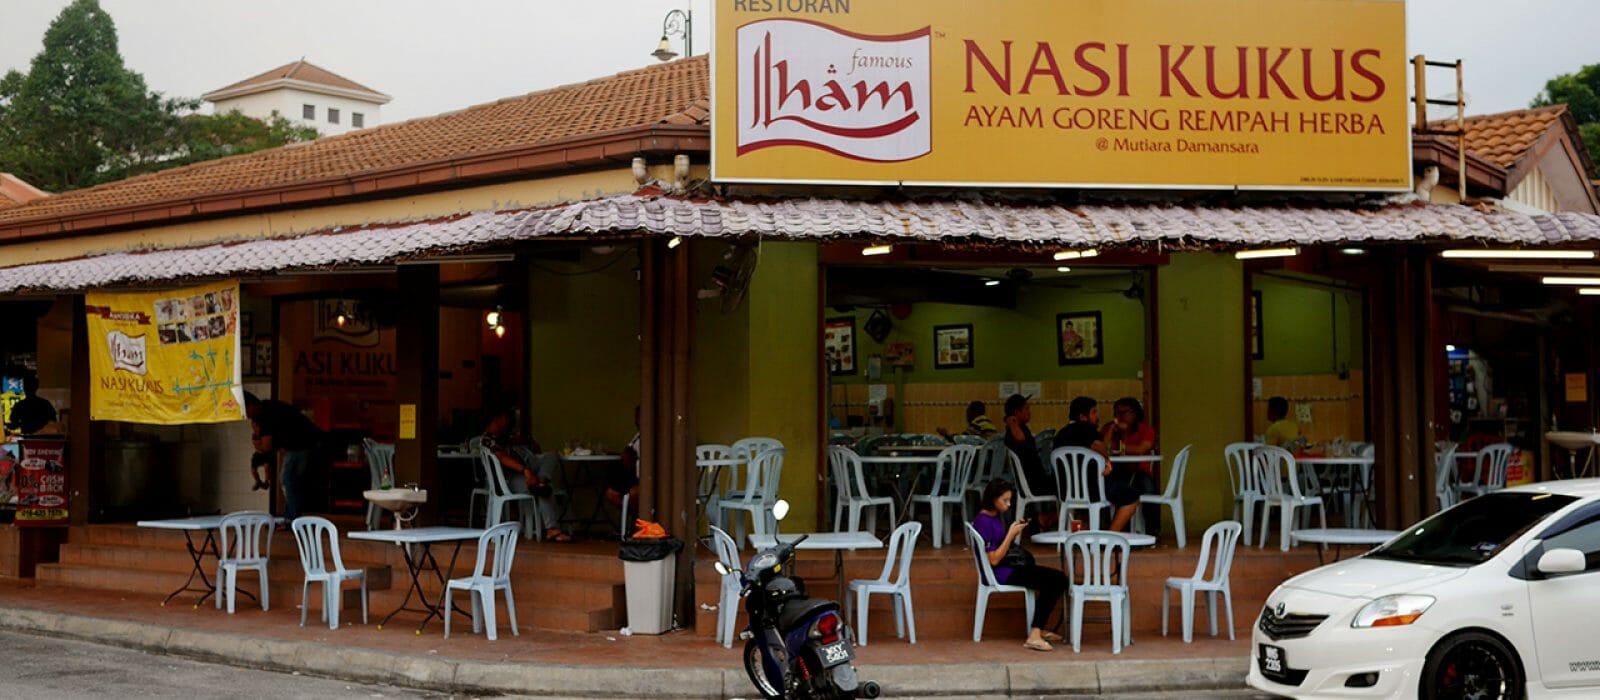 Nasi Kukus Ilham, Mutiara Damansara